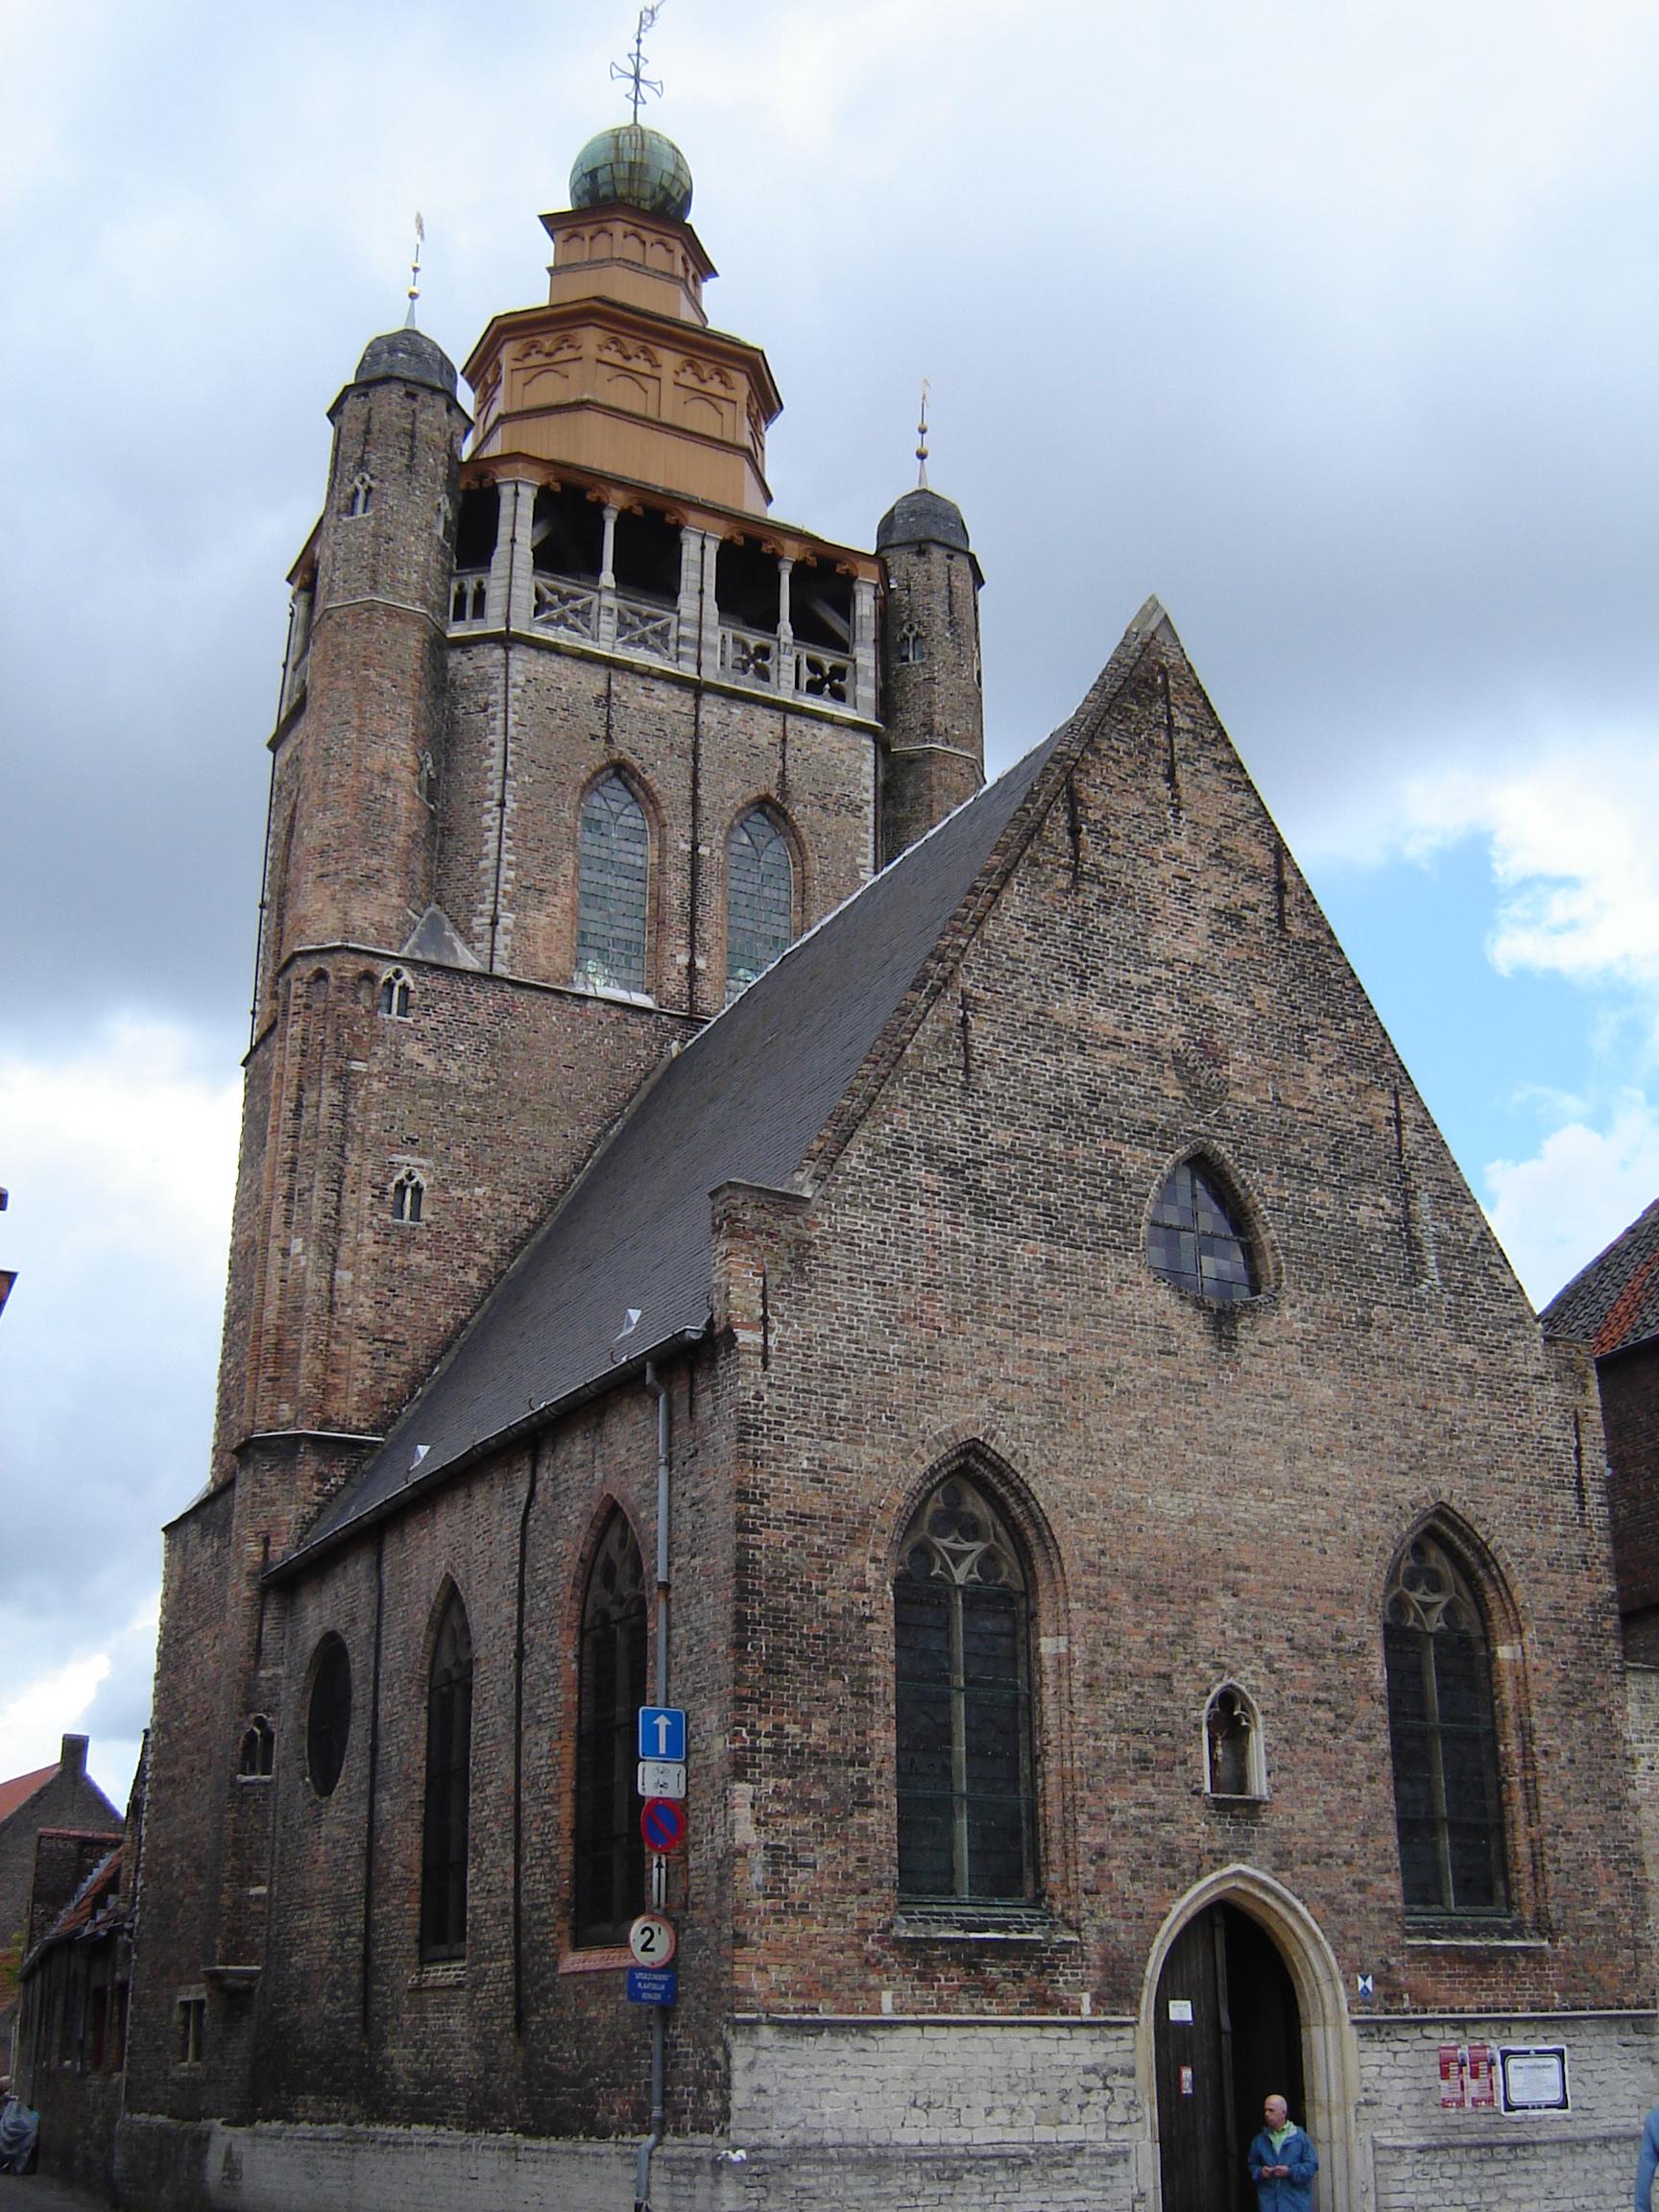 Brugge_-_Jeruzalemkerk_1.jpg